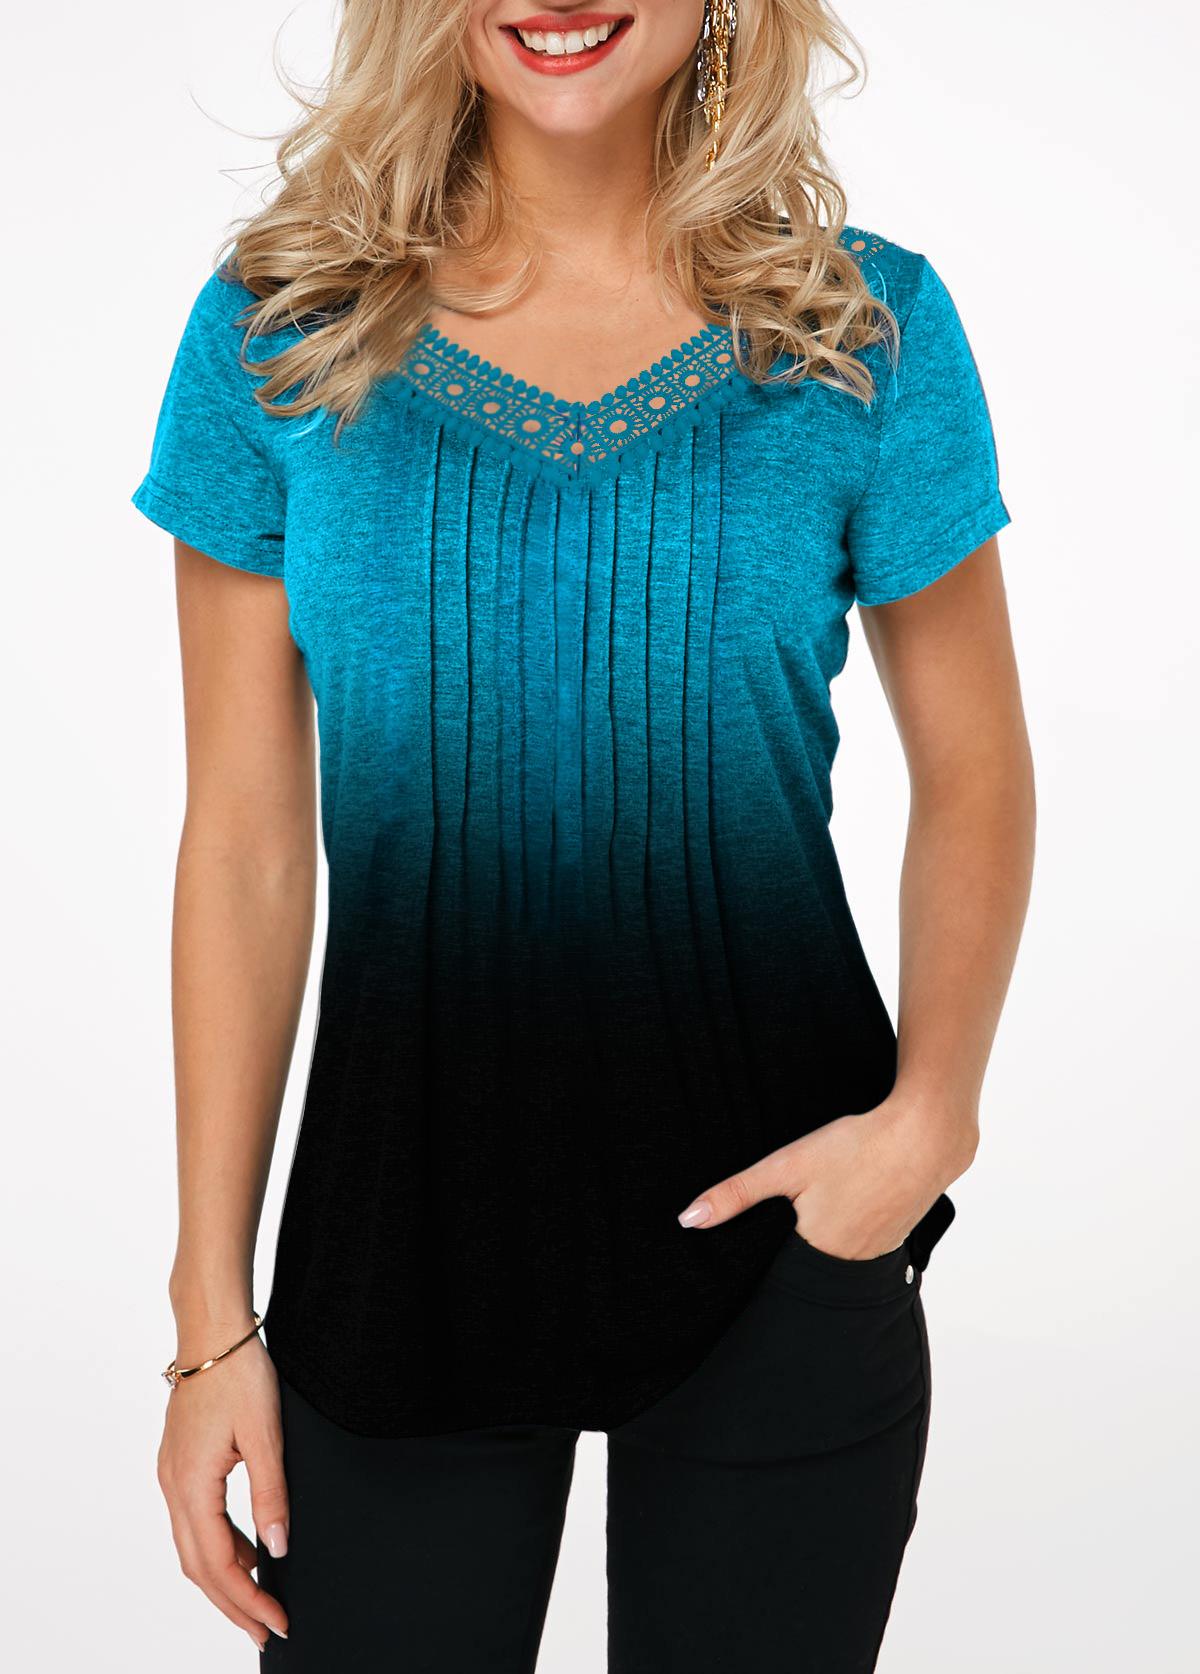 Lace Patchwork Gradient Crinkle Chest T Shirt